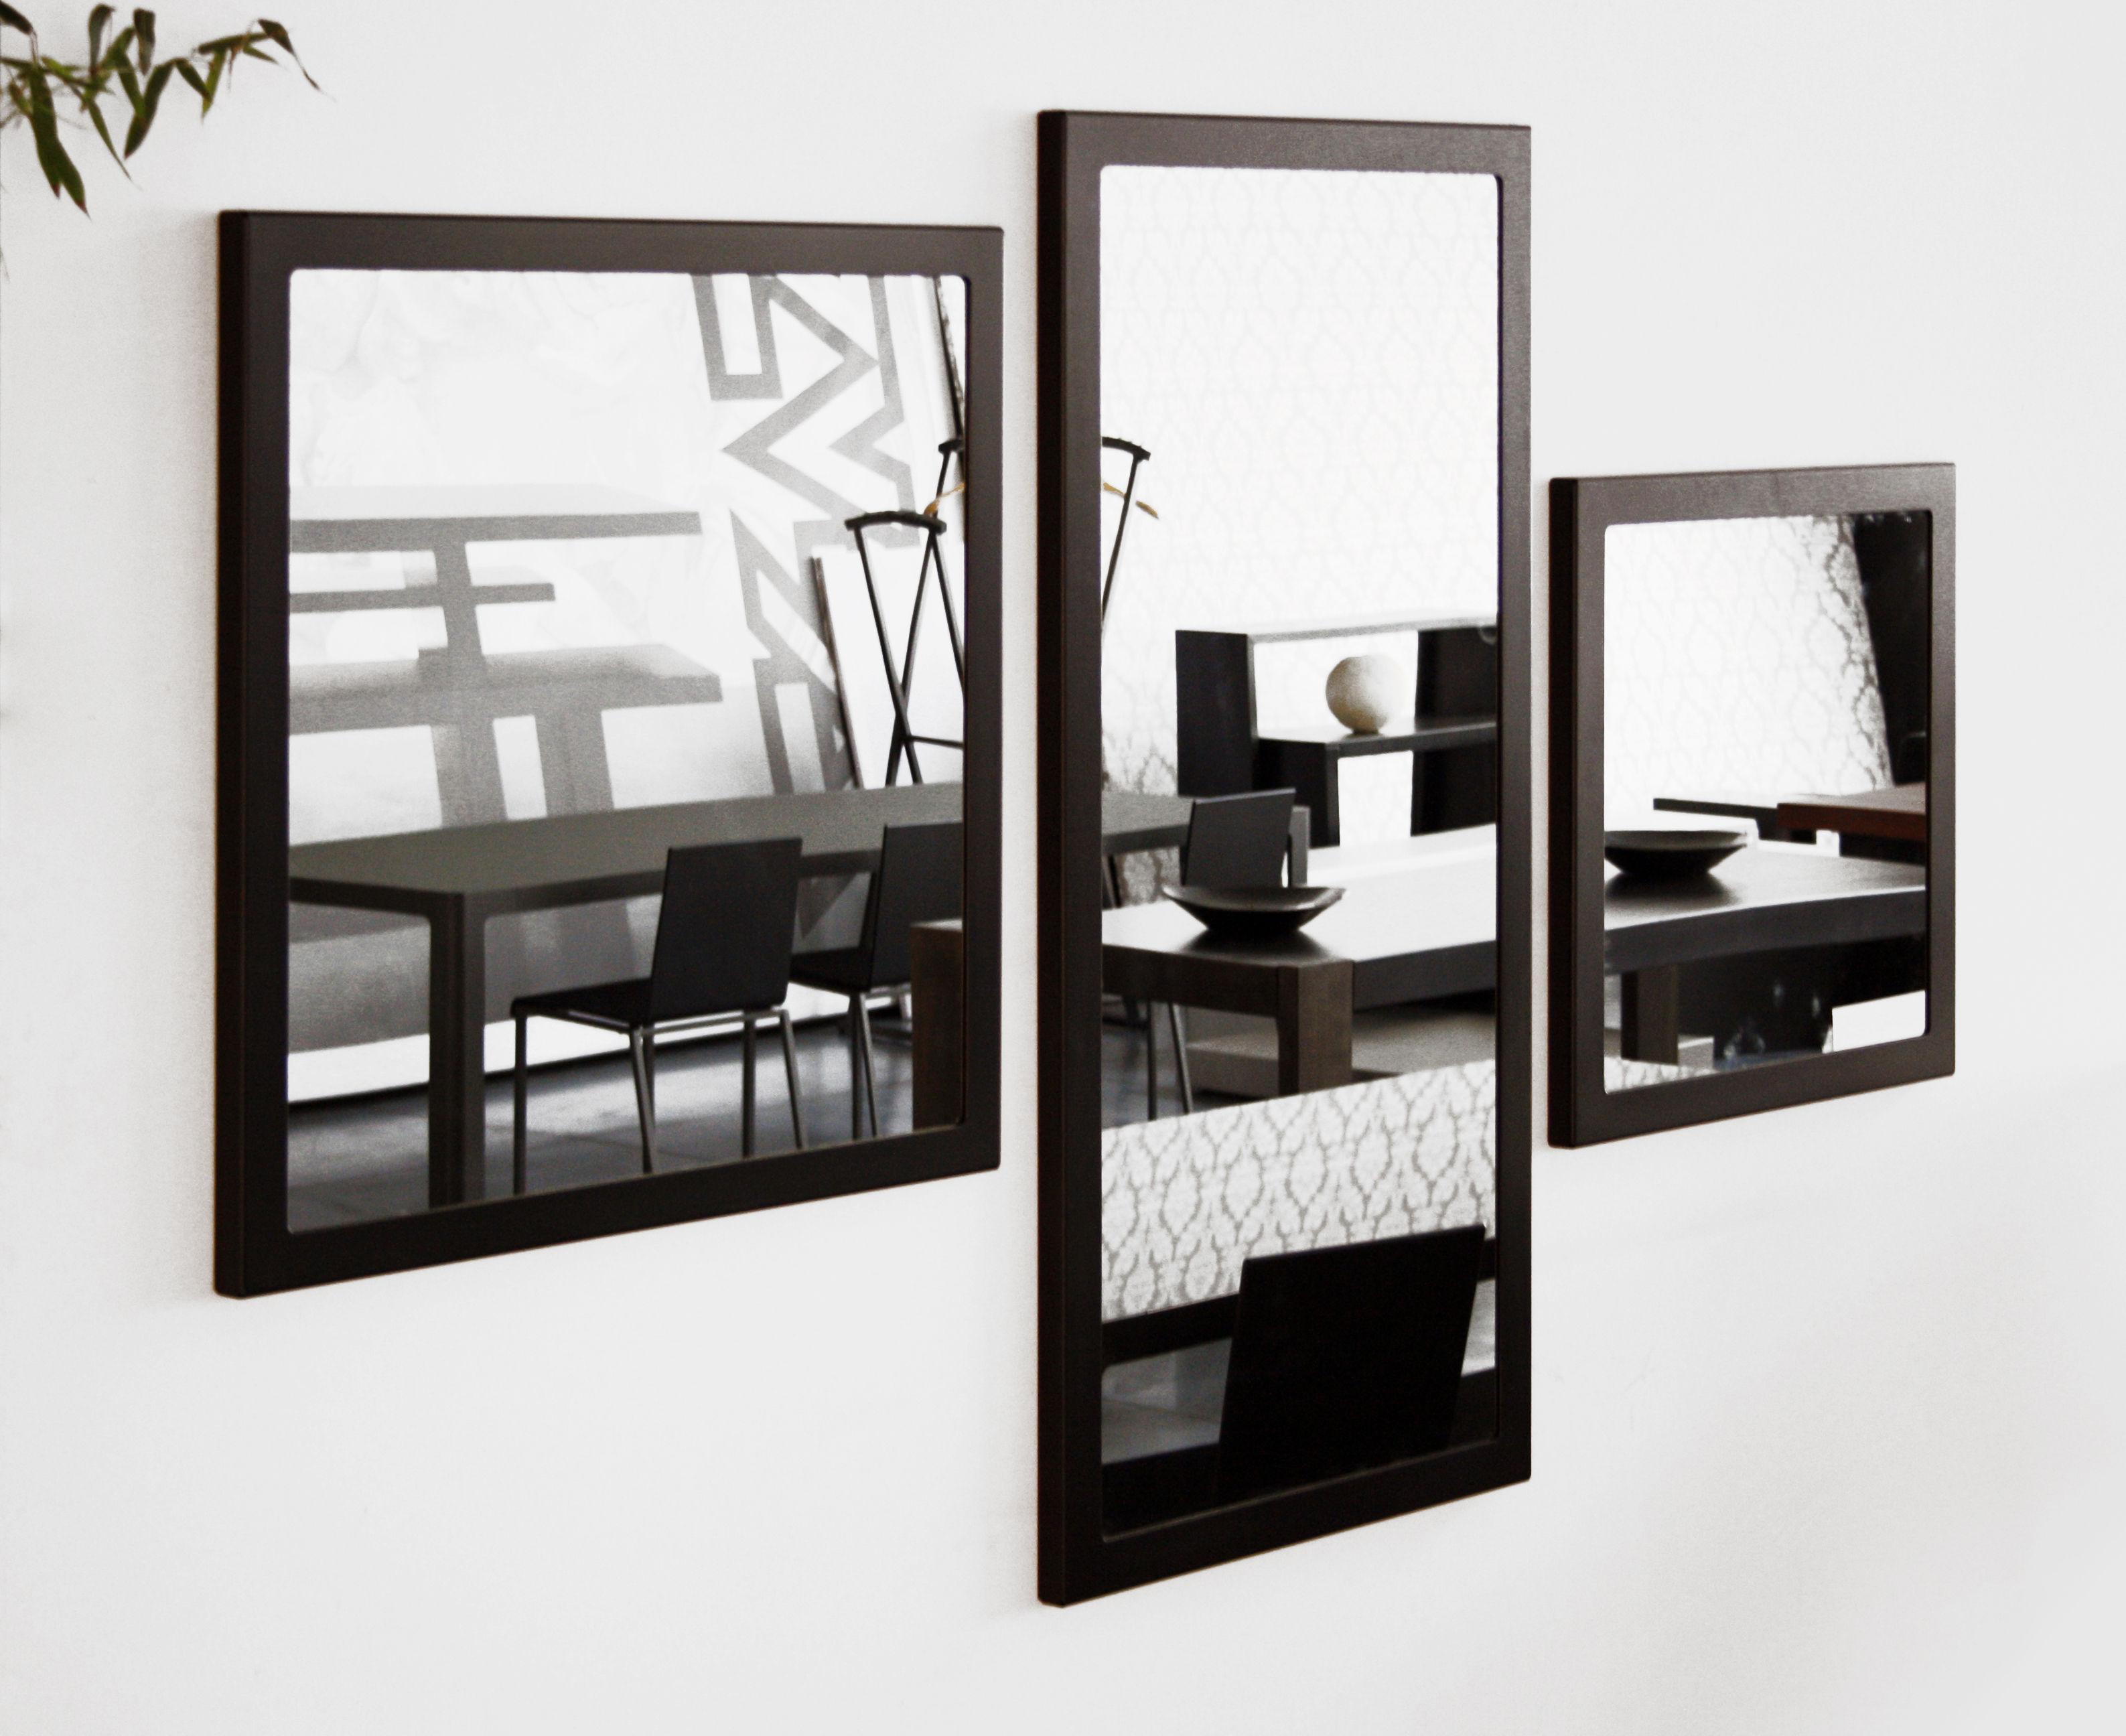 Miroir little frame 60 x 60 cm blanc demi opaque zeus for Miroir salle de bain 90 x 60